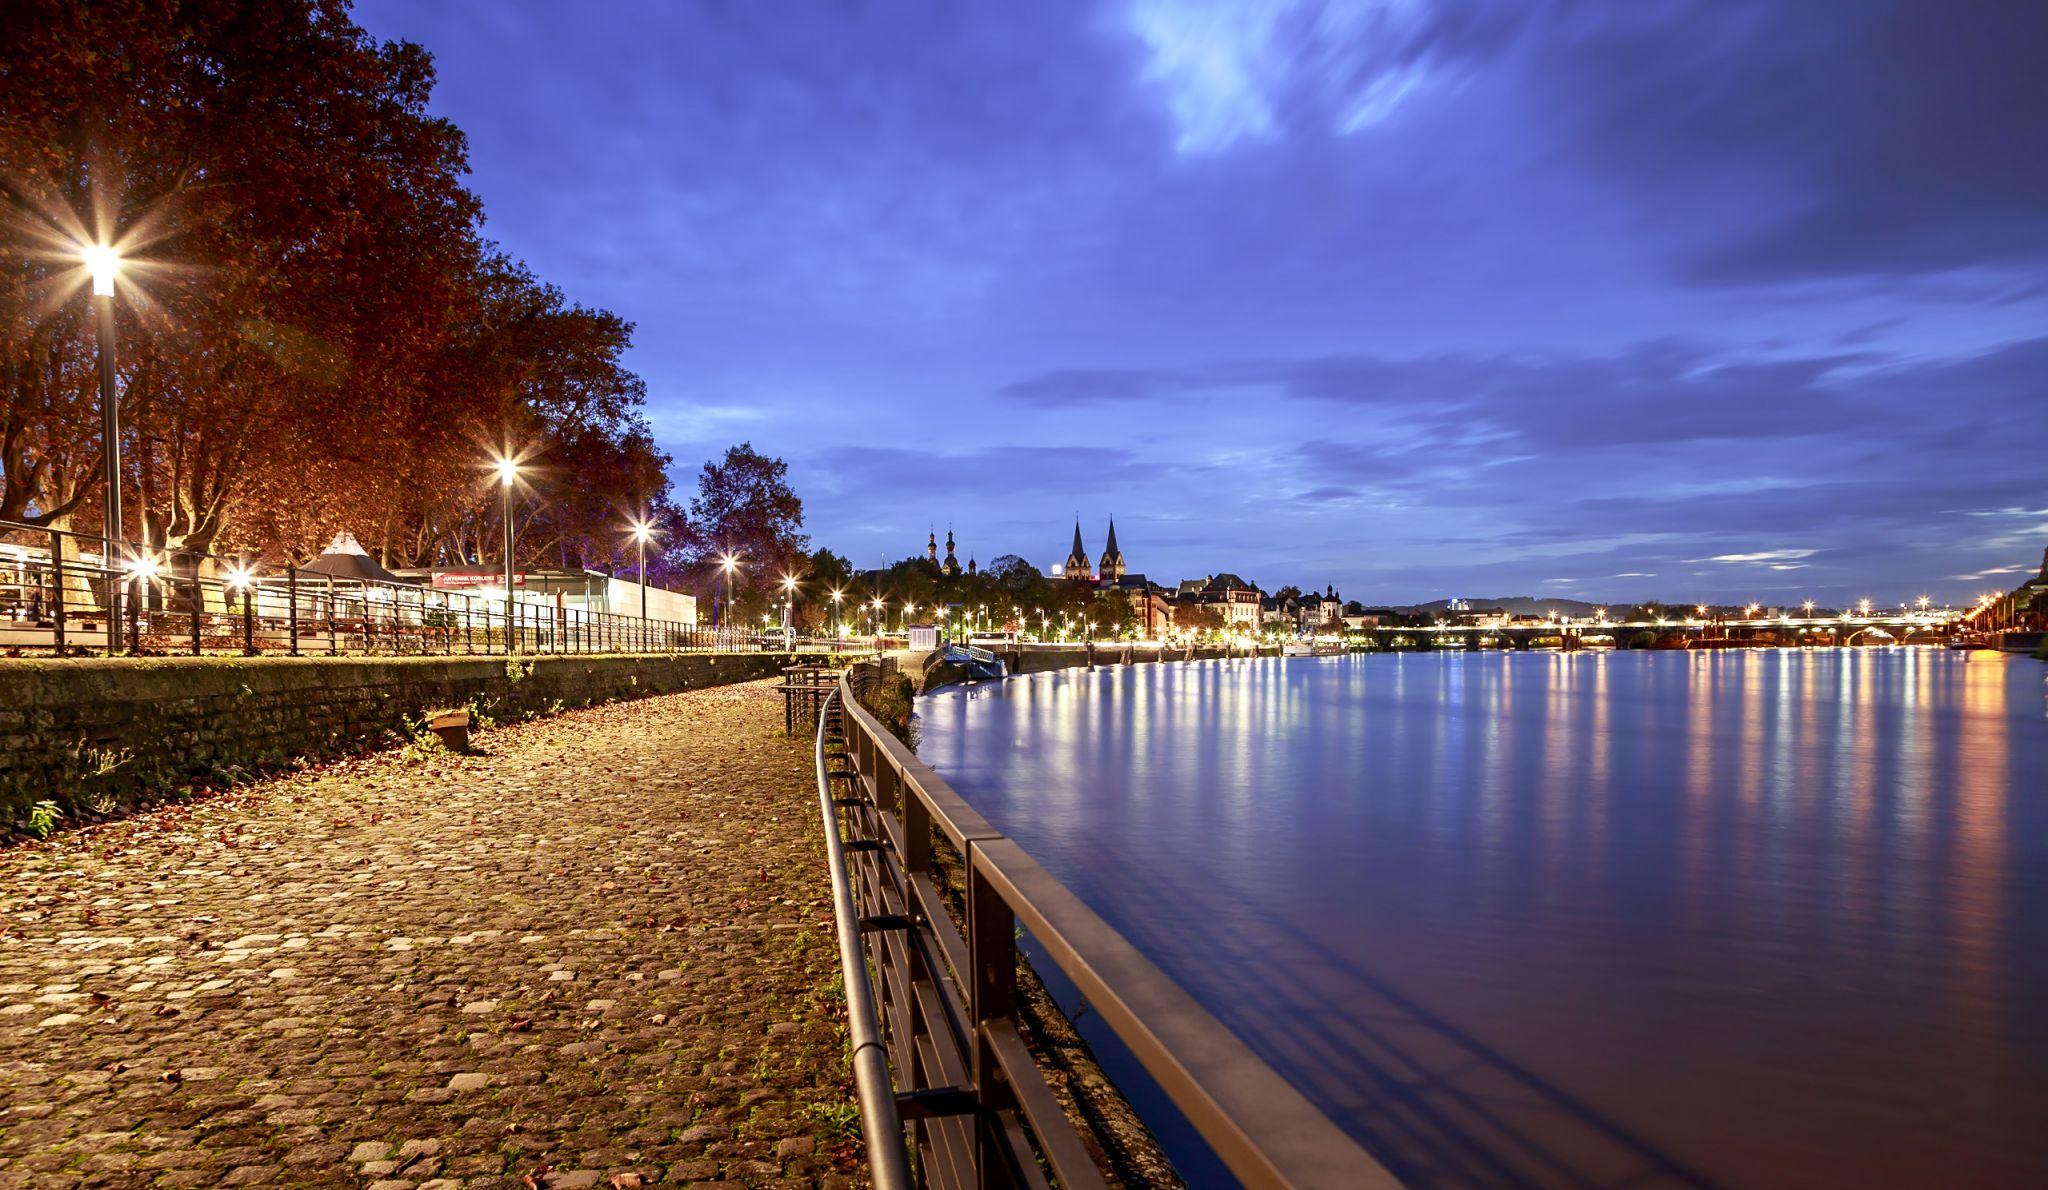 Moselufer, Koblenz, Germany